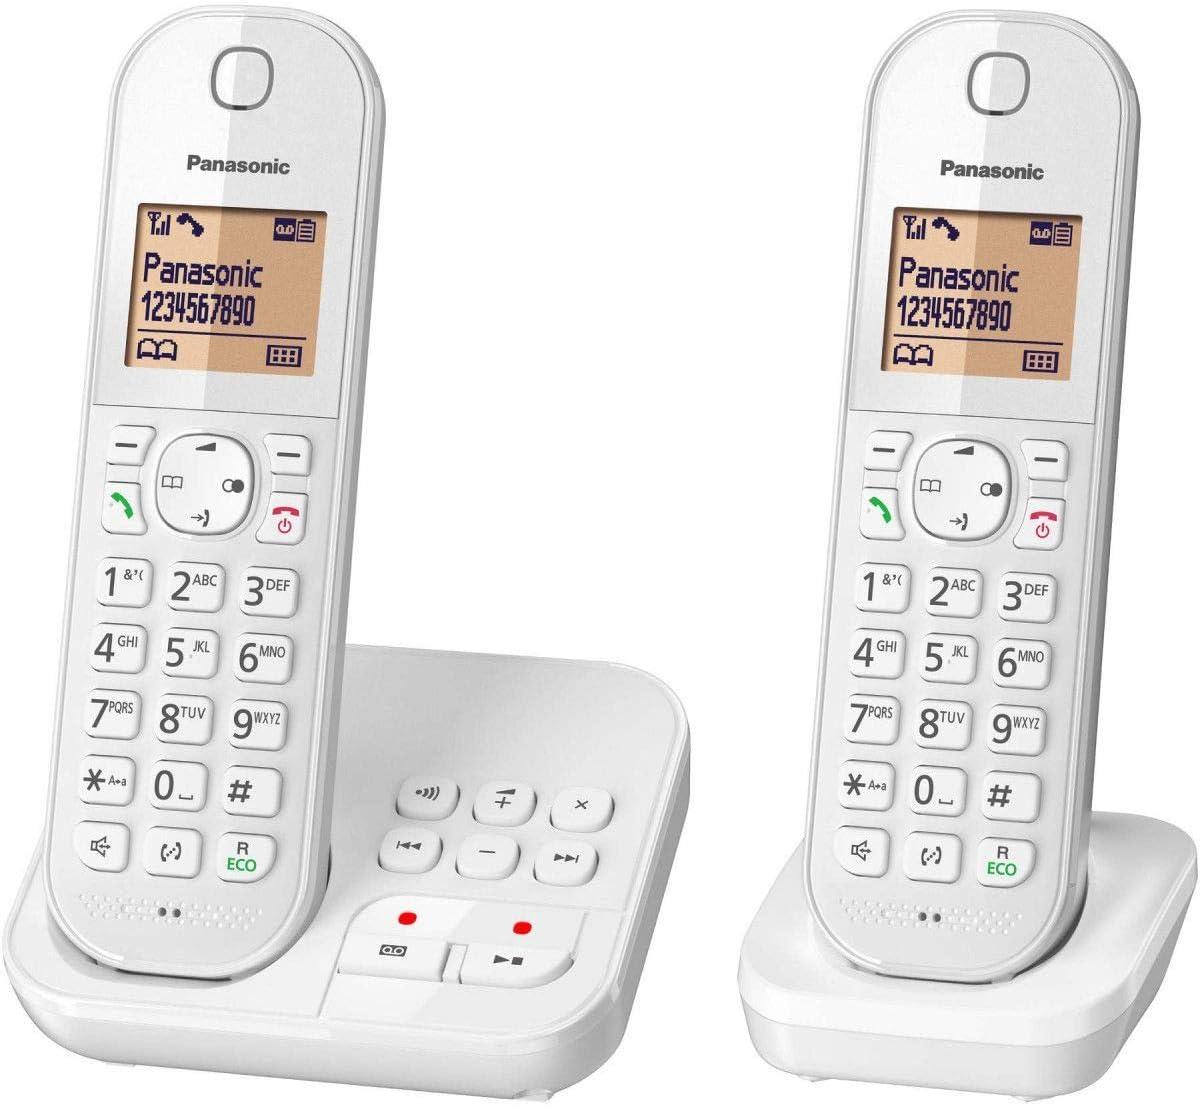 Panasonic KX-TGC422FRW - Teléfono (Teléfono DECT, Terminal inalámbrico, Altavoz, 120 entradas, Identificador de Llamadas, Blanco): Amazon.es: Electrónica